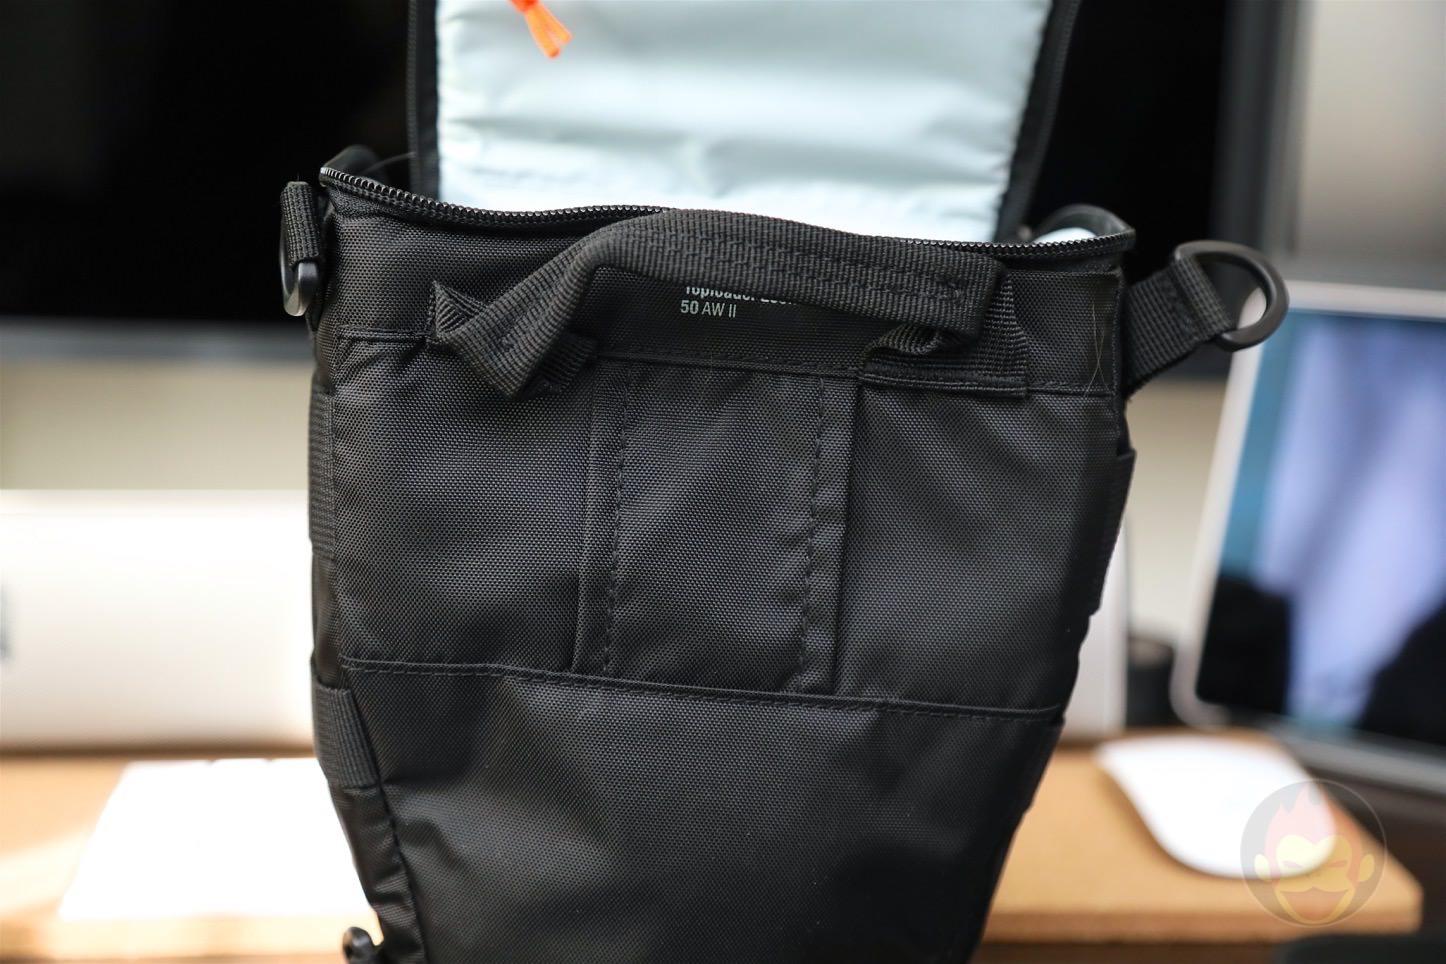 Lowepro-Camera-bag-Toploader-Zoom-AW2-06.jpg